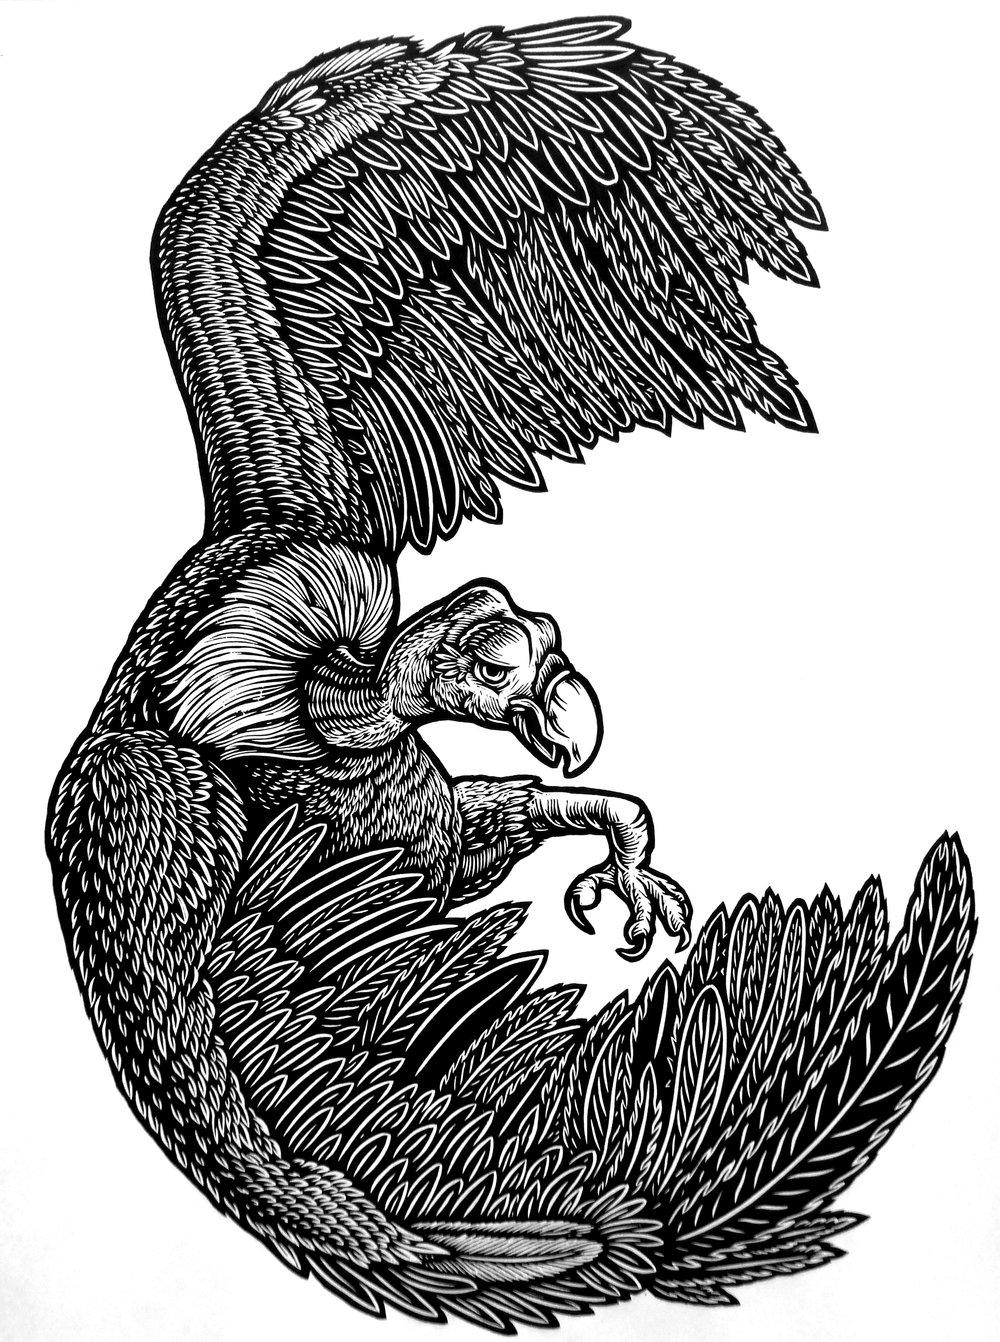 Vulture Noosh! XL - T-shirt **FREE SHIPPING**